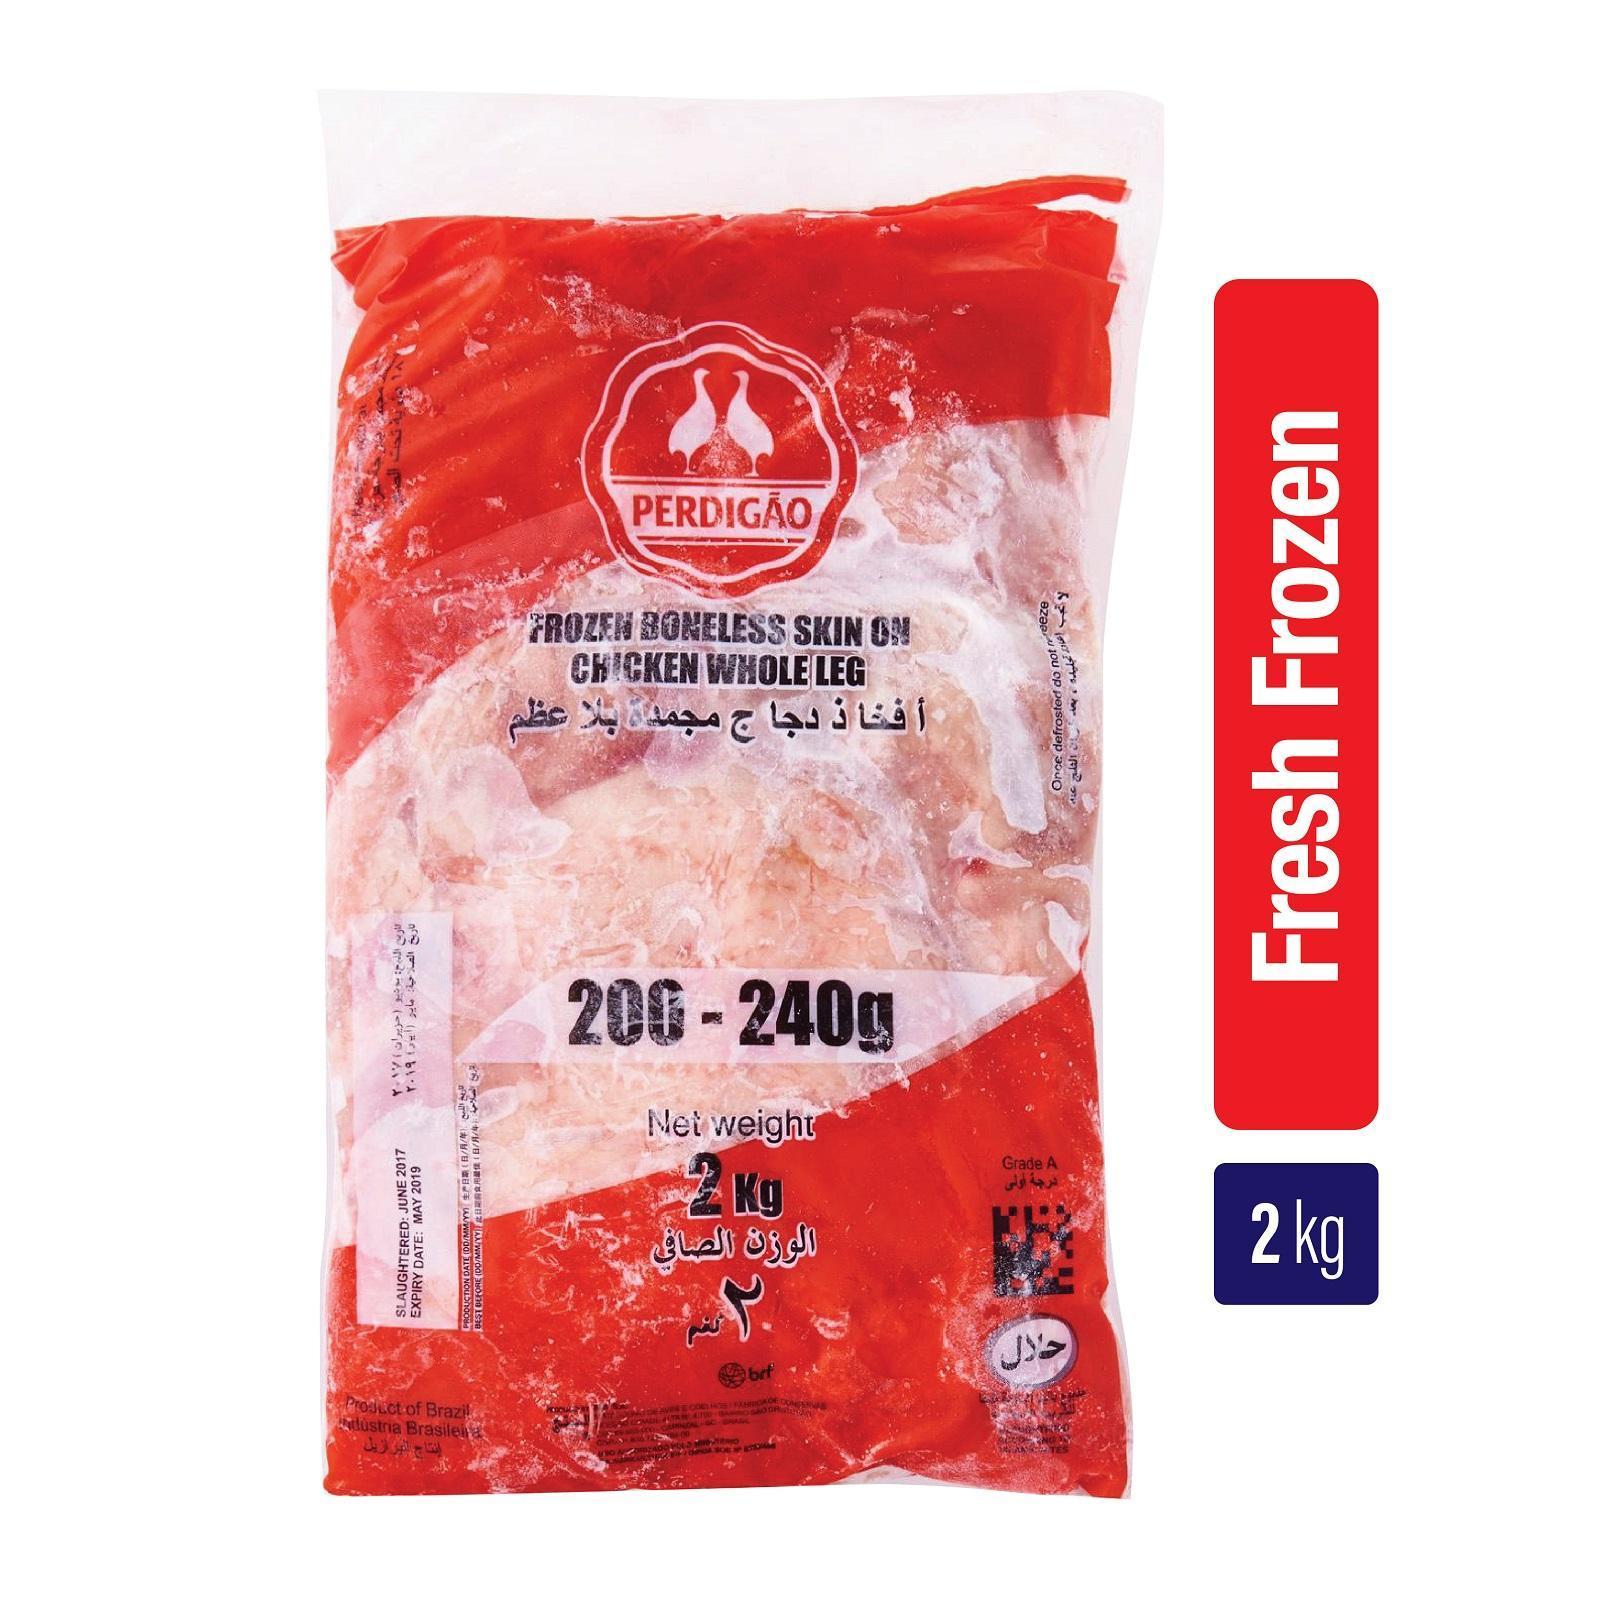 Perdigao Boneless Chicken Whole Leg - Frozen